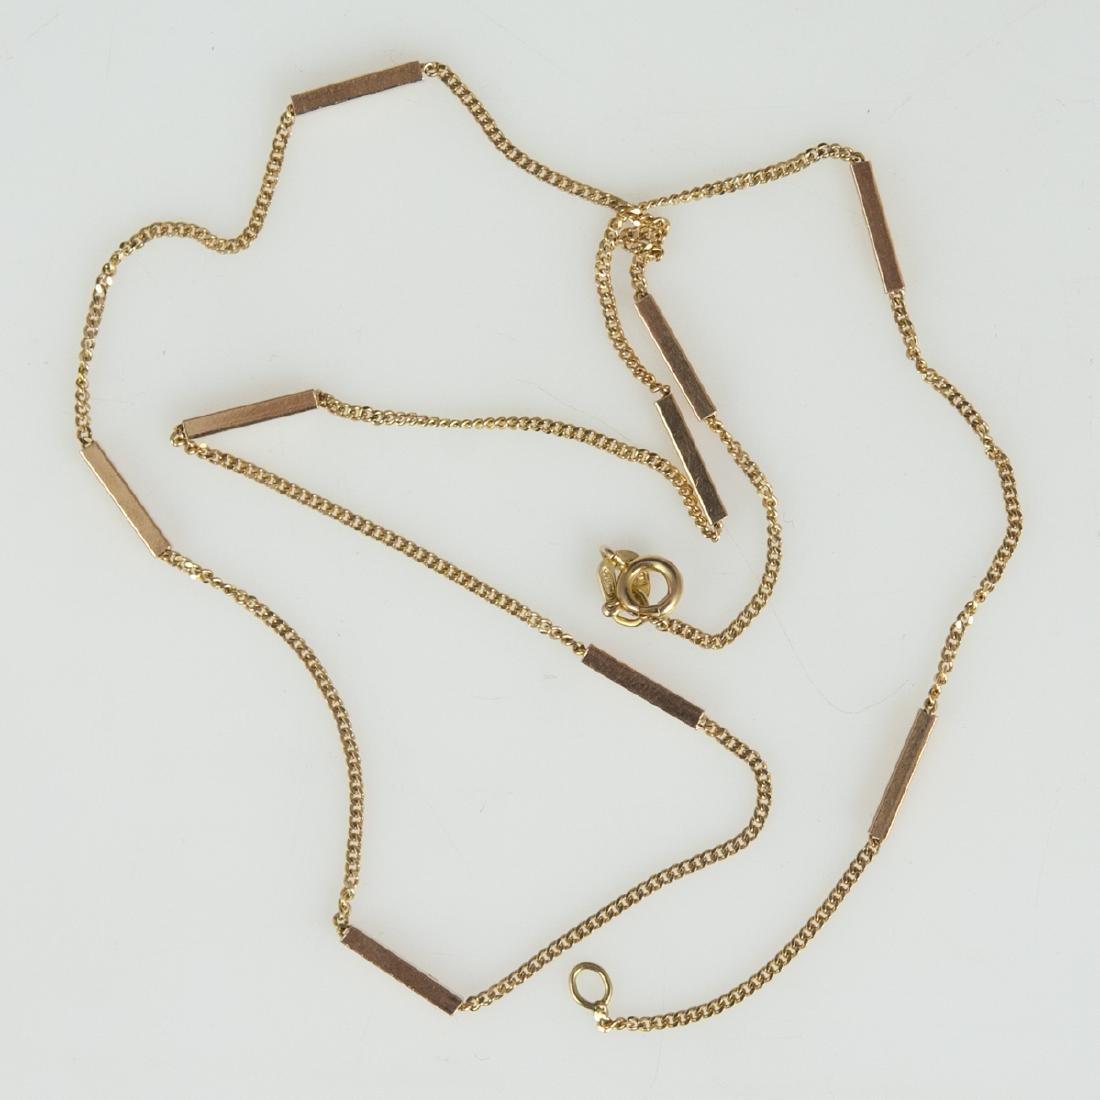 Balestra Italian 14kt Gold Necklace